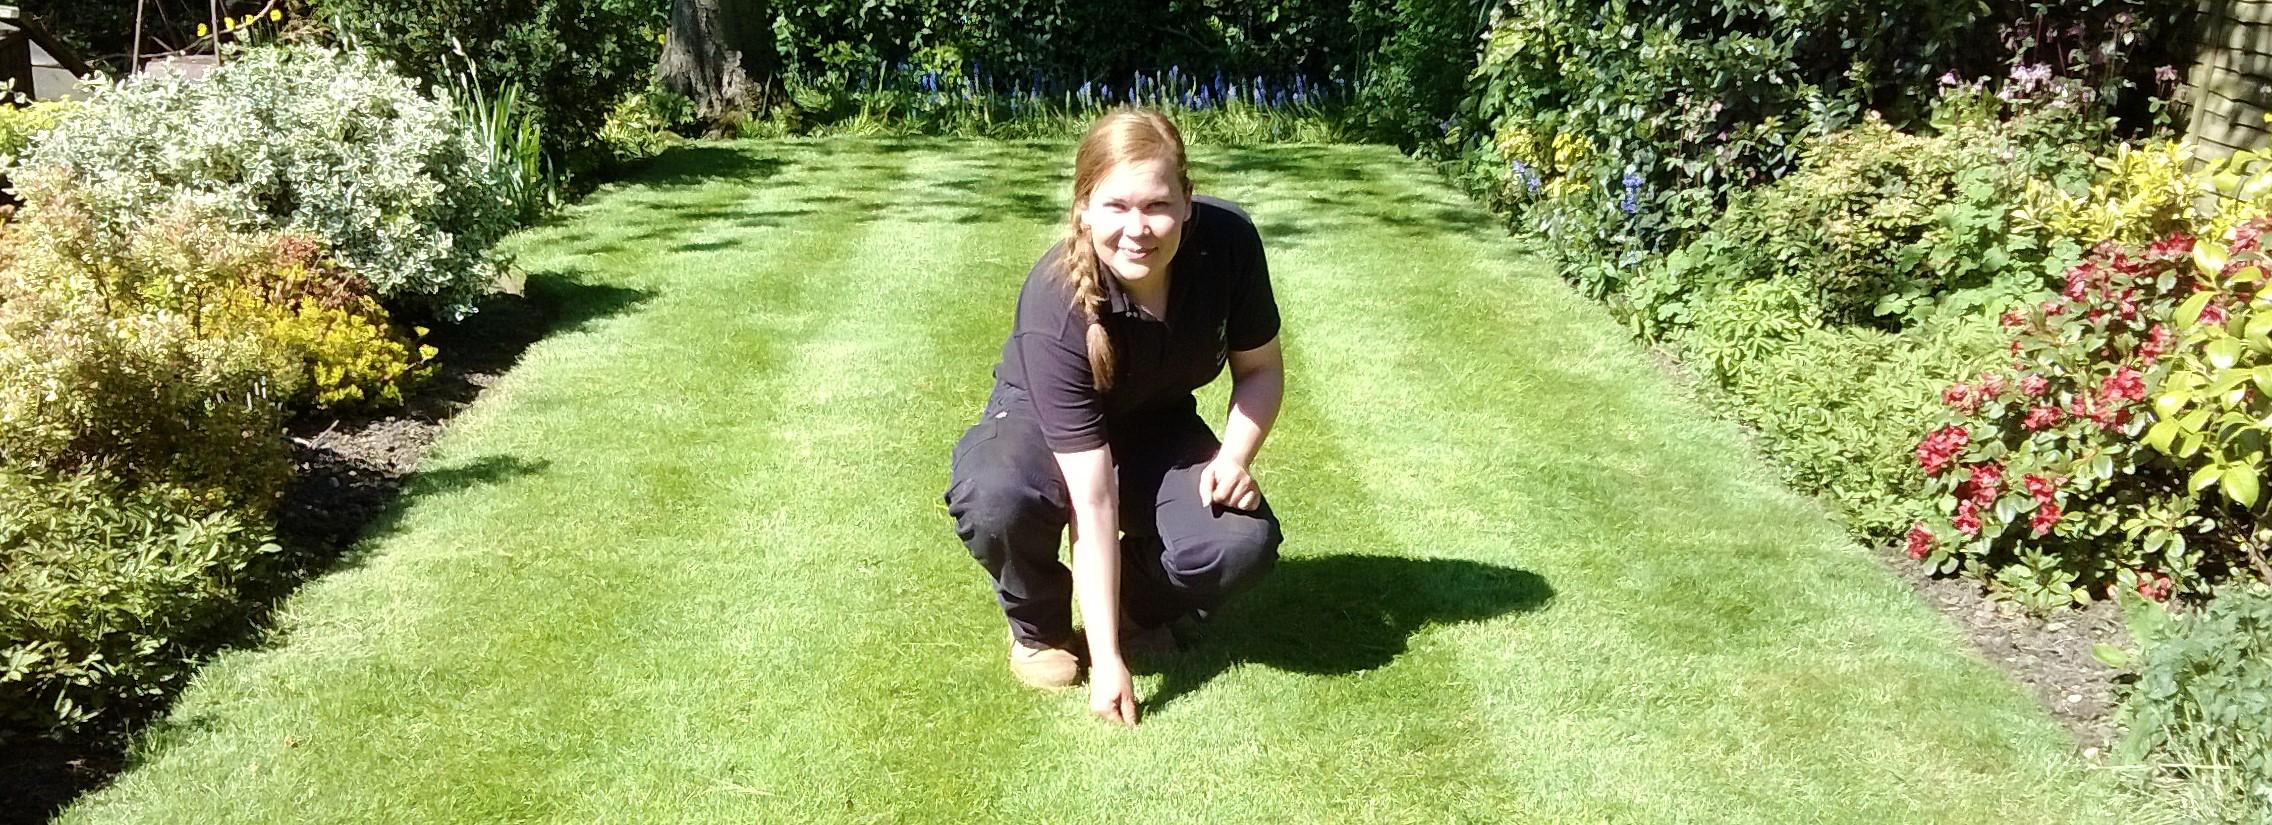 Lawn Assessment